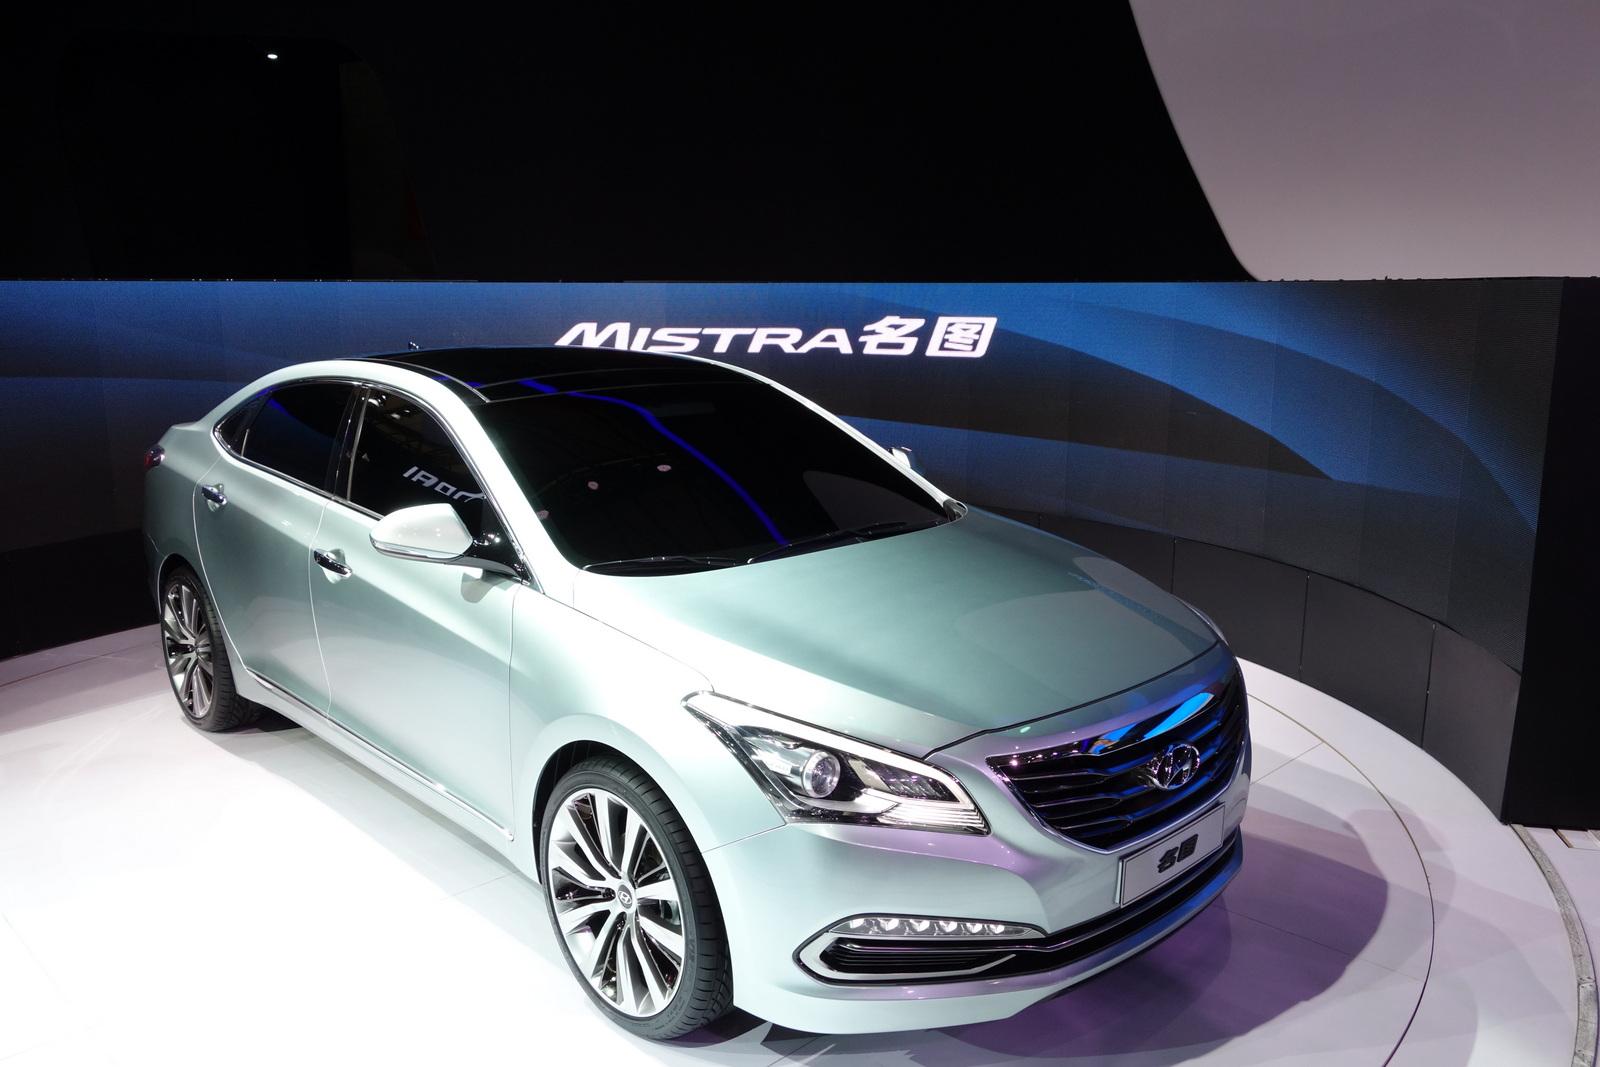 Hyundai Mistra concept